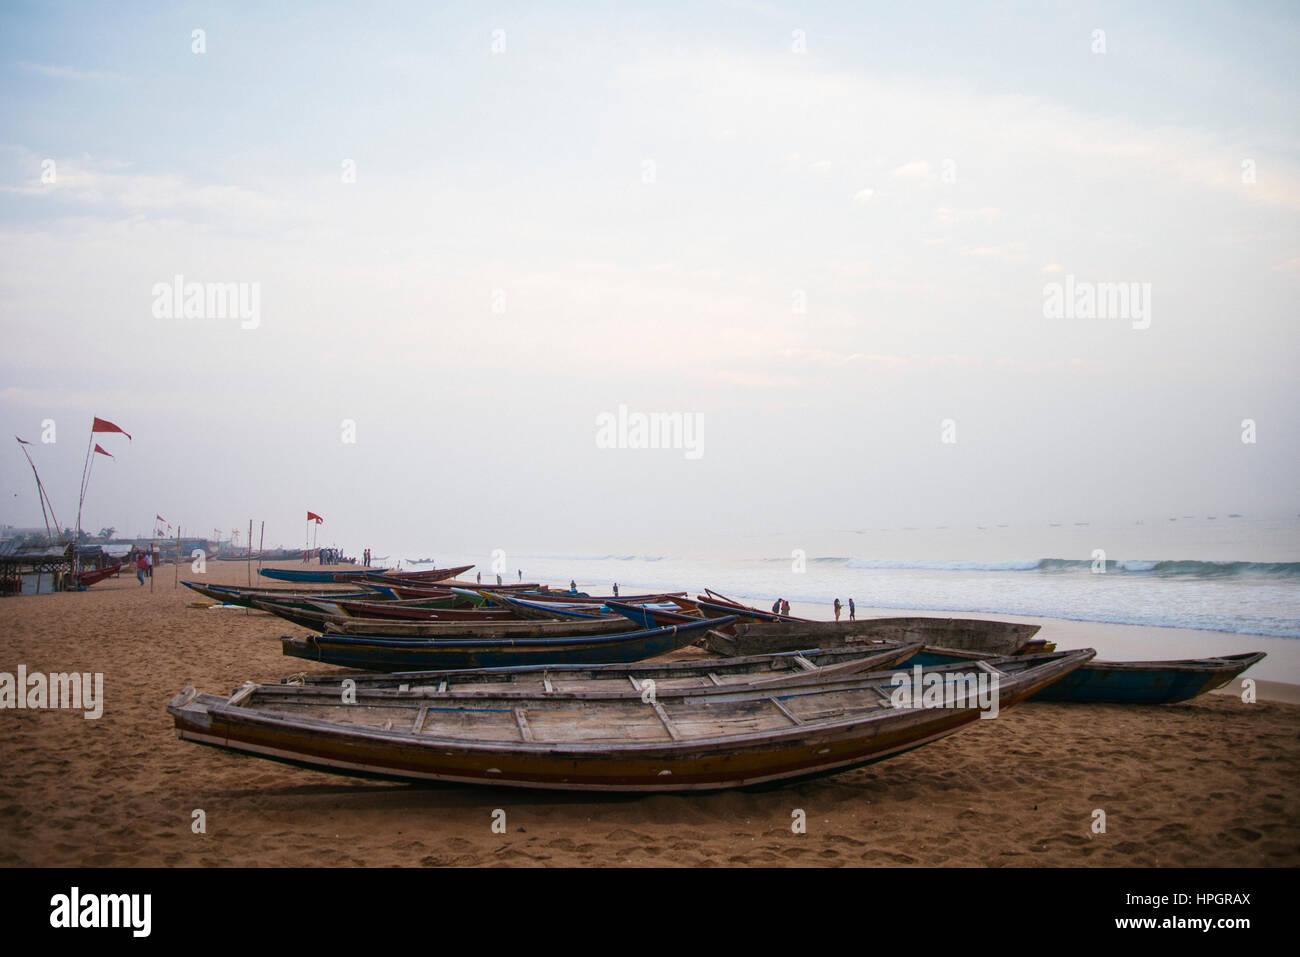 Fishing boats, Puri, India. Stock Photo